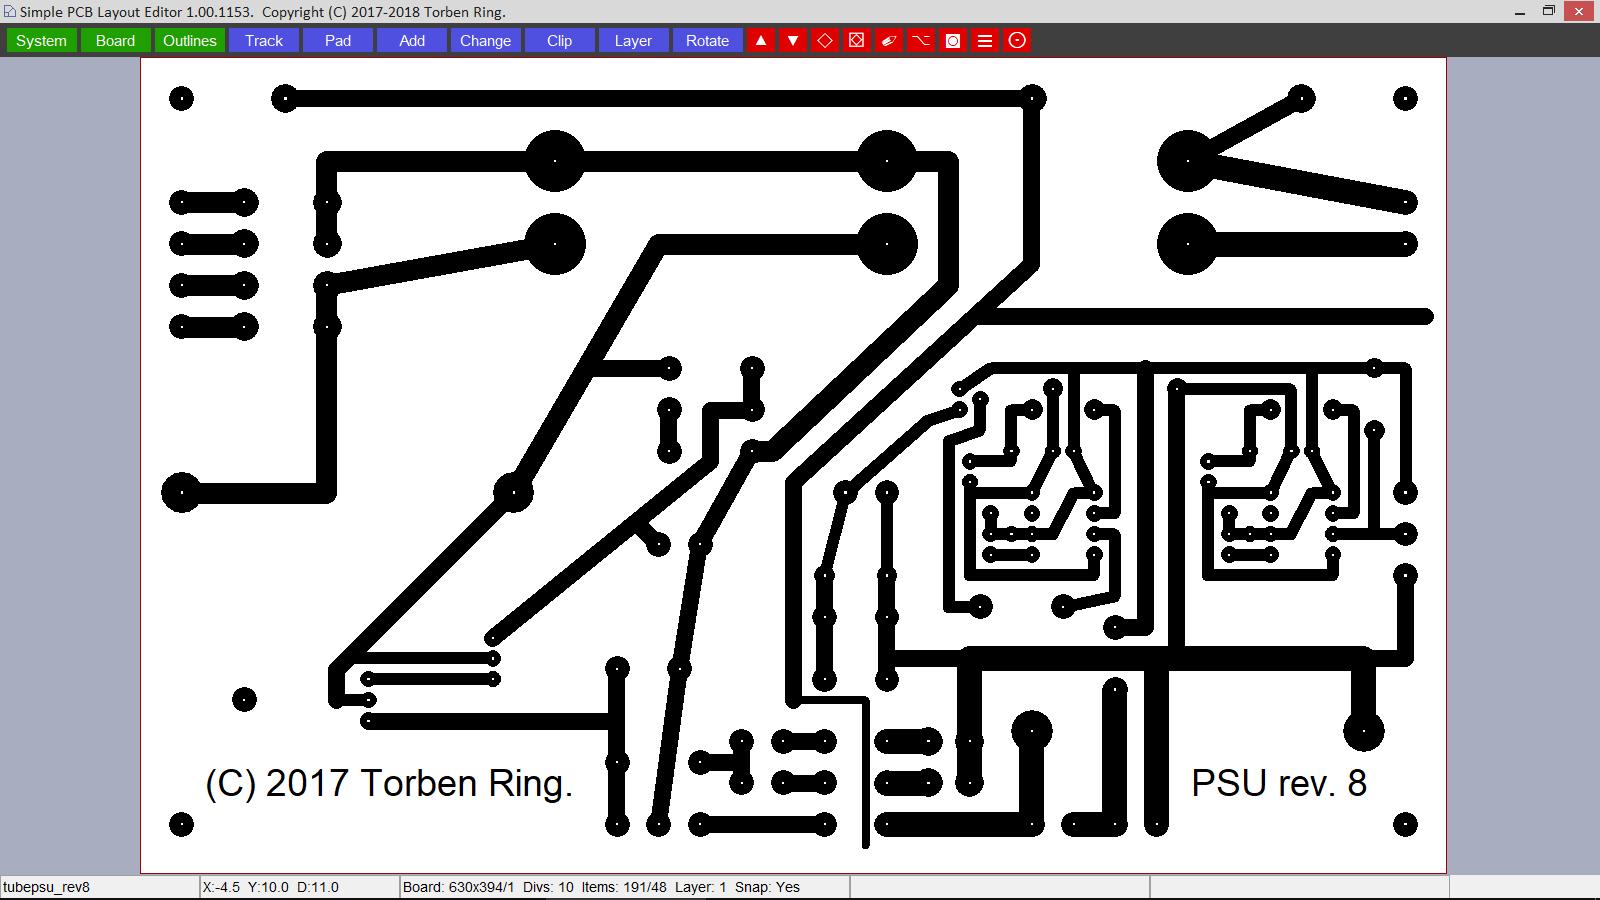 TorbenRing.com